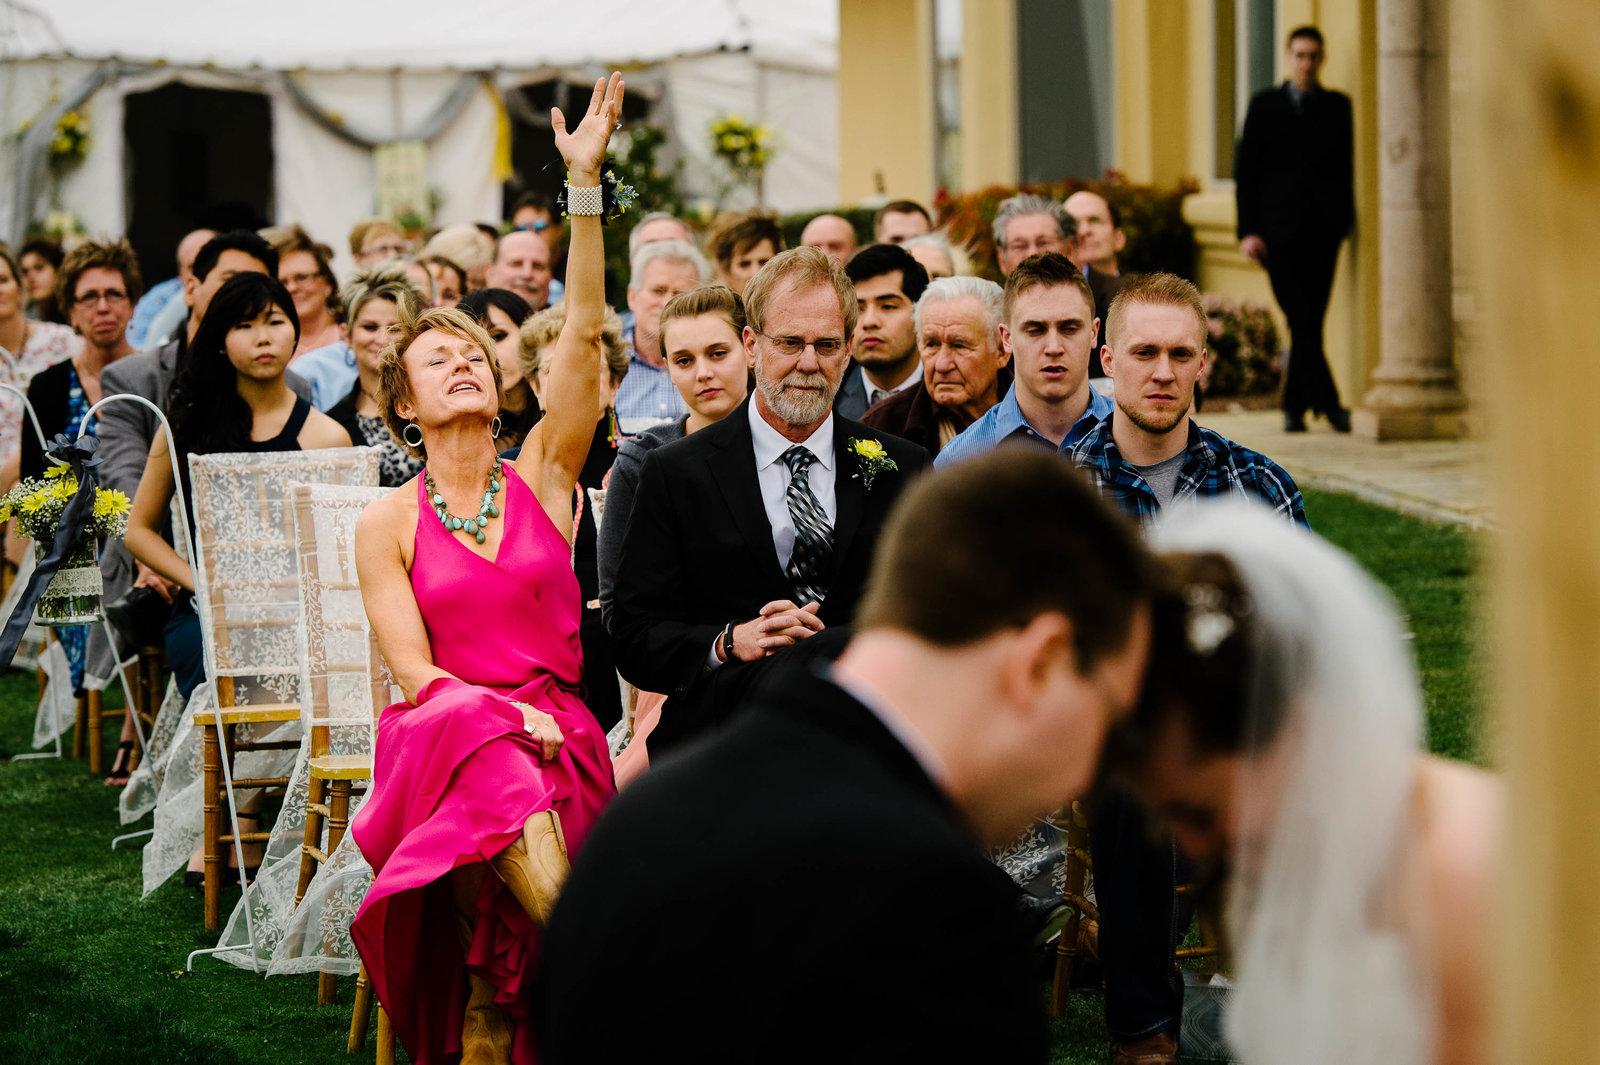 205-El-paso-wedding-photographer-El Paso Wedding Photographer_M56